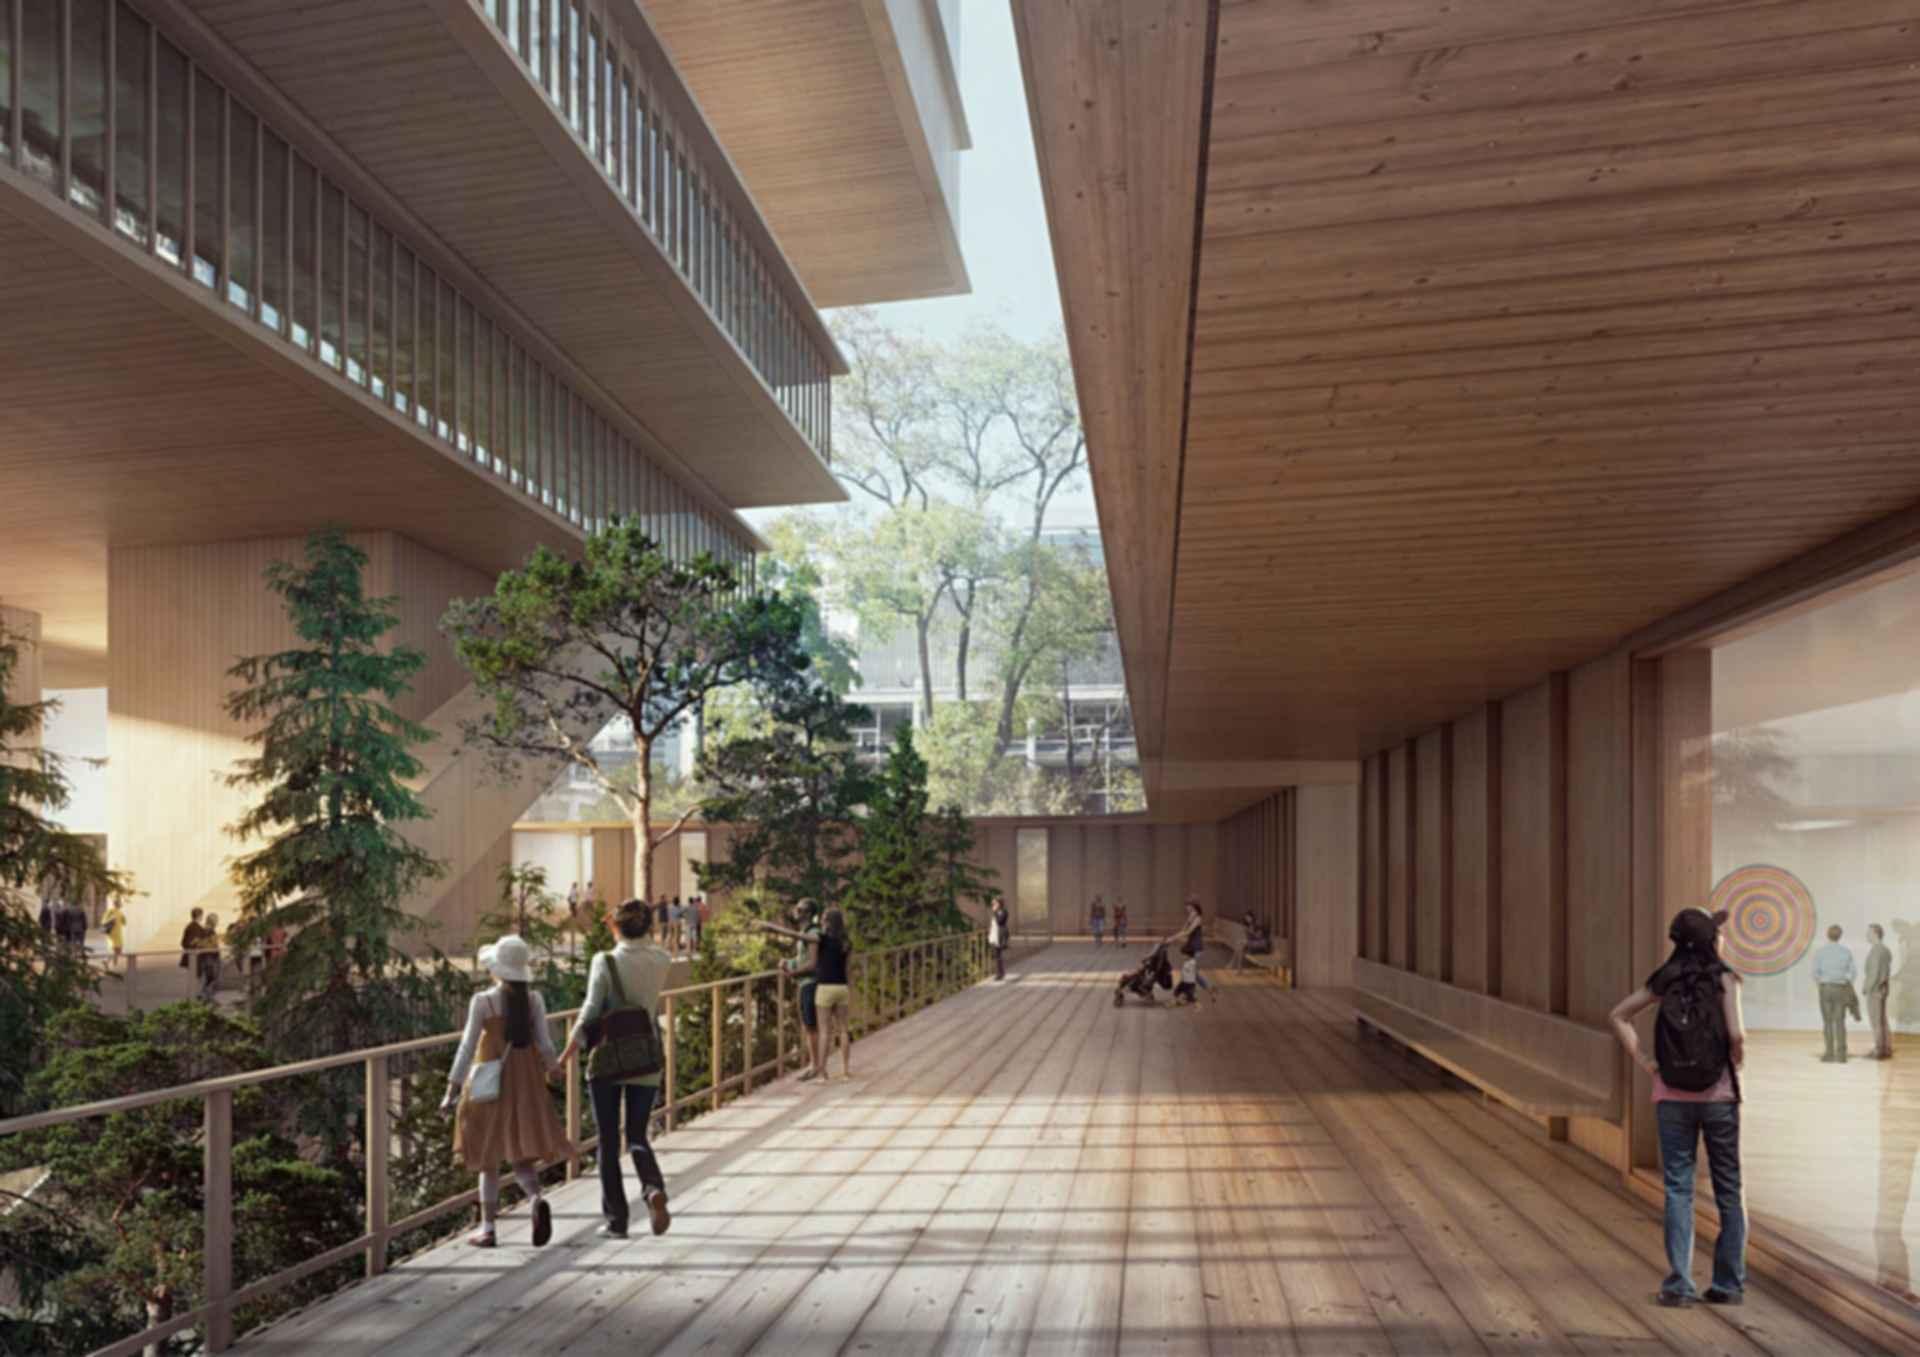 Vancouver Art Gallery - concept design exterior